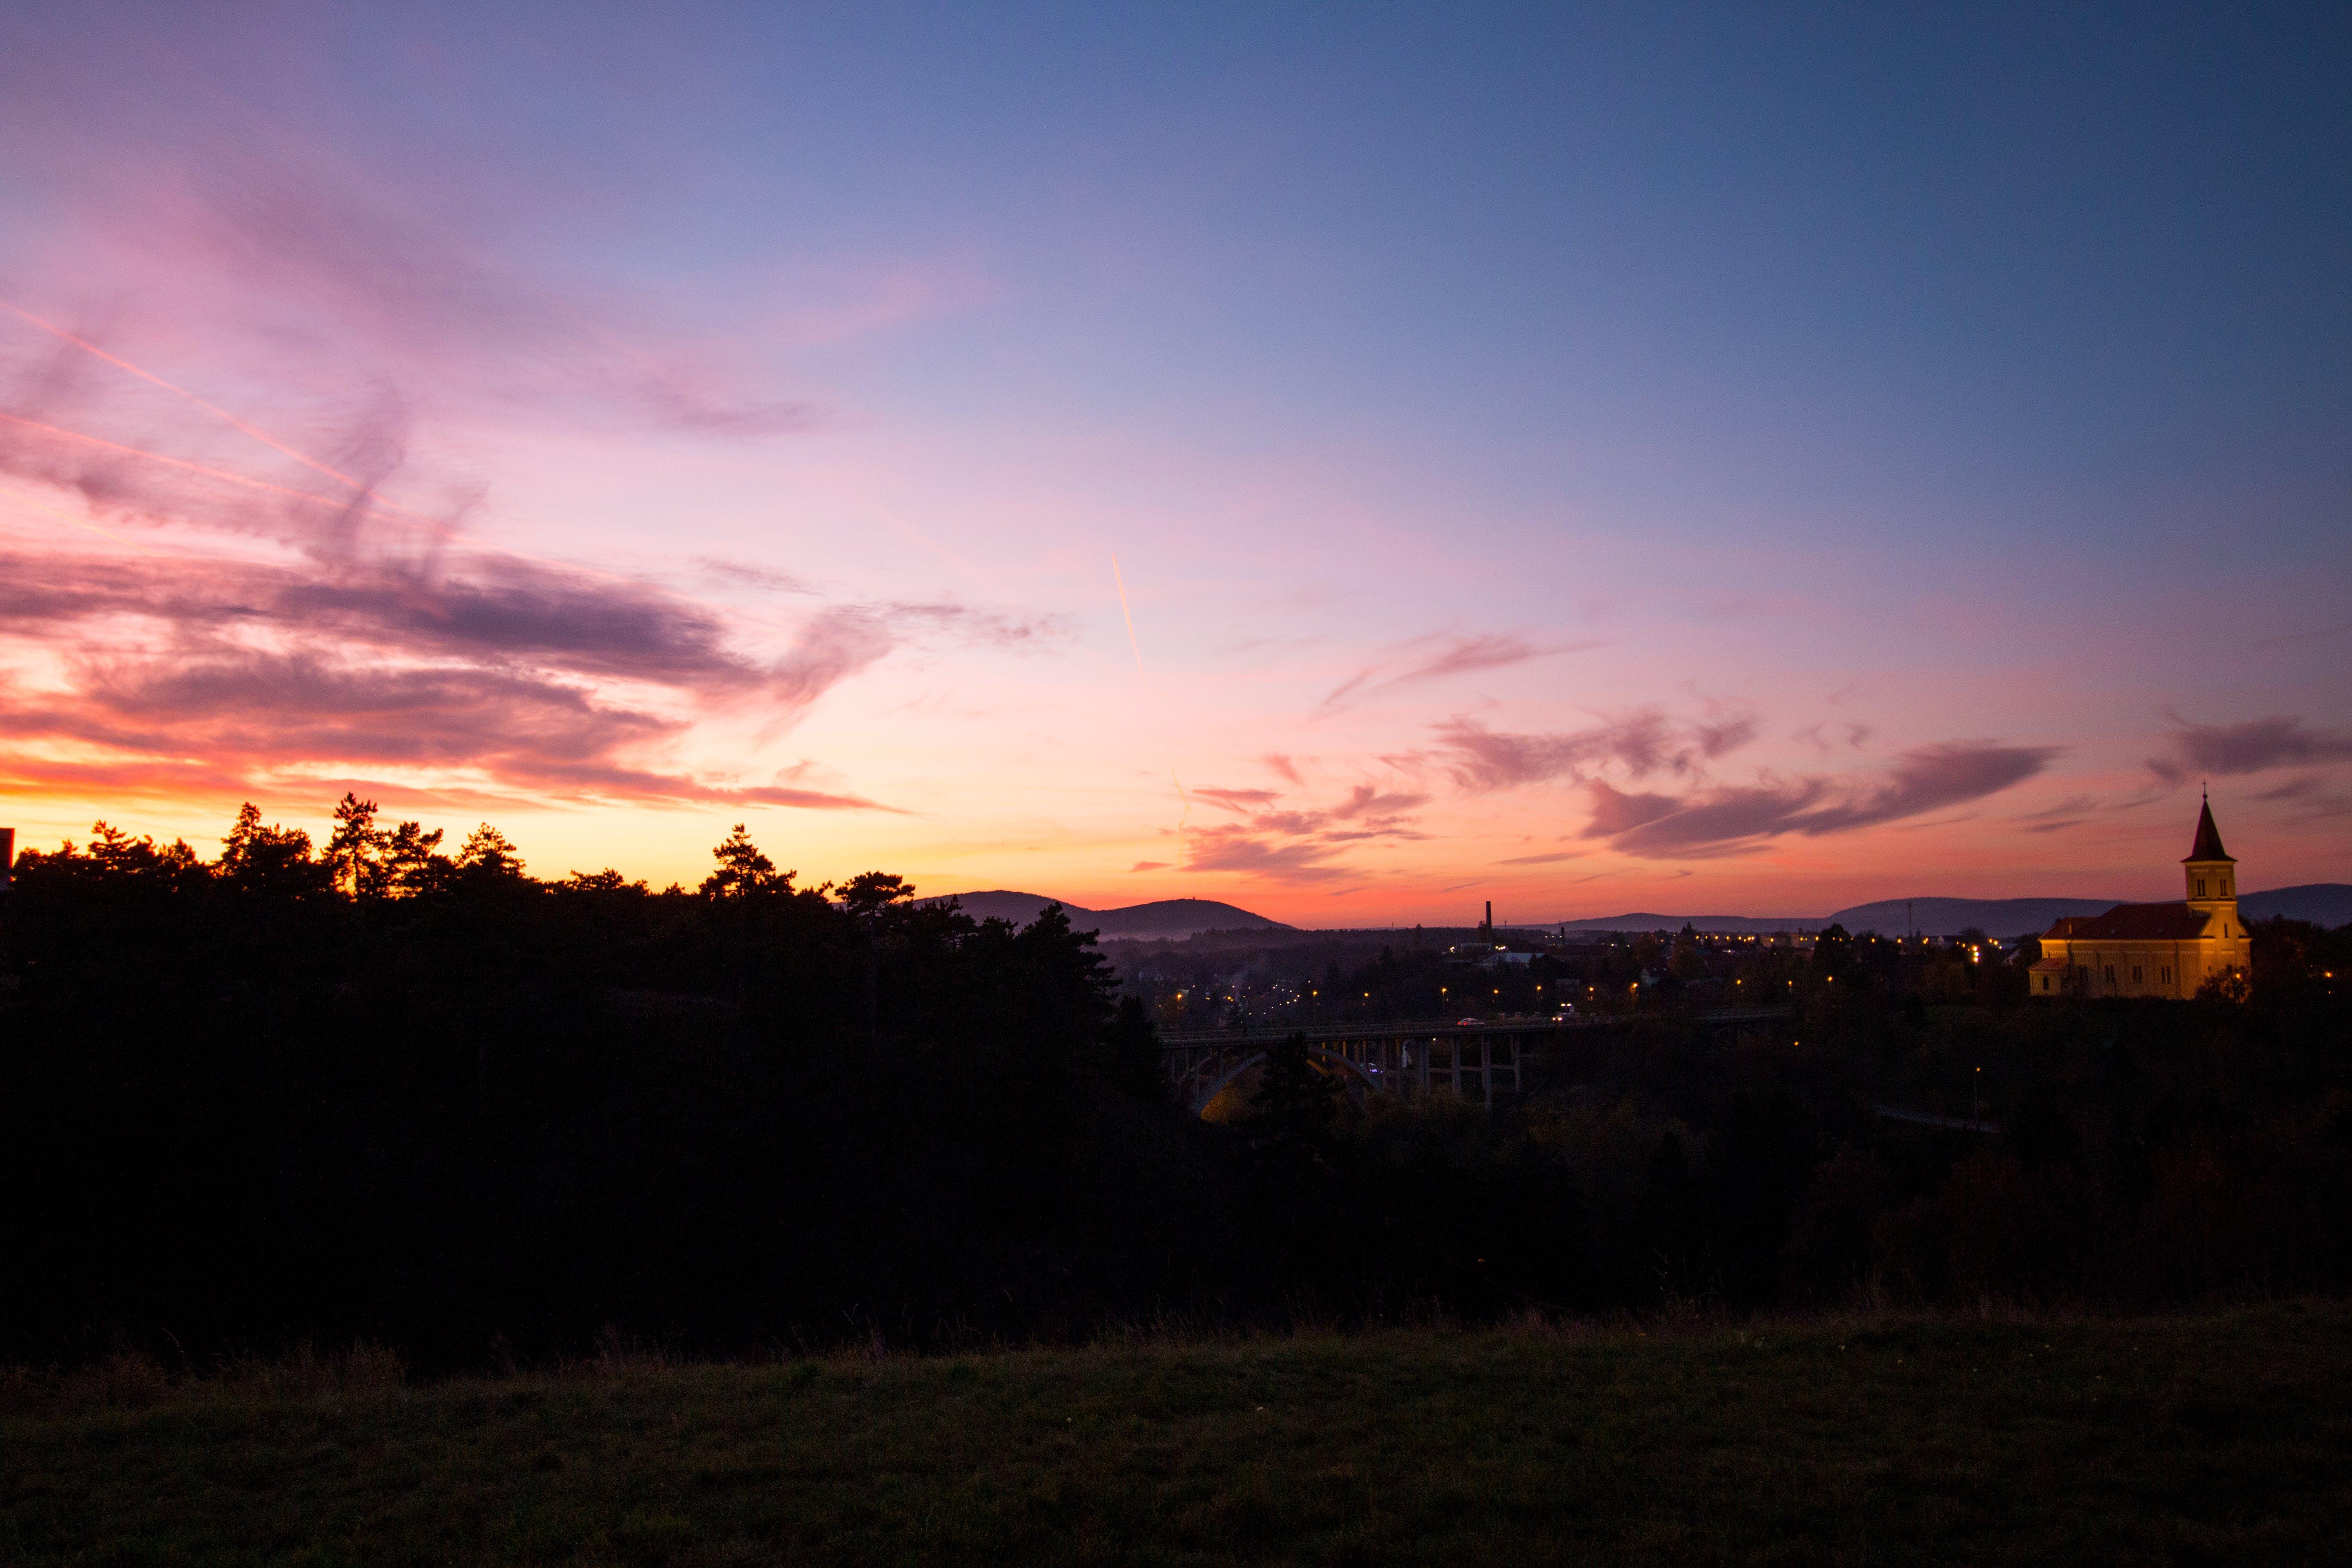 Sunrise of a Village